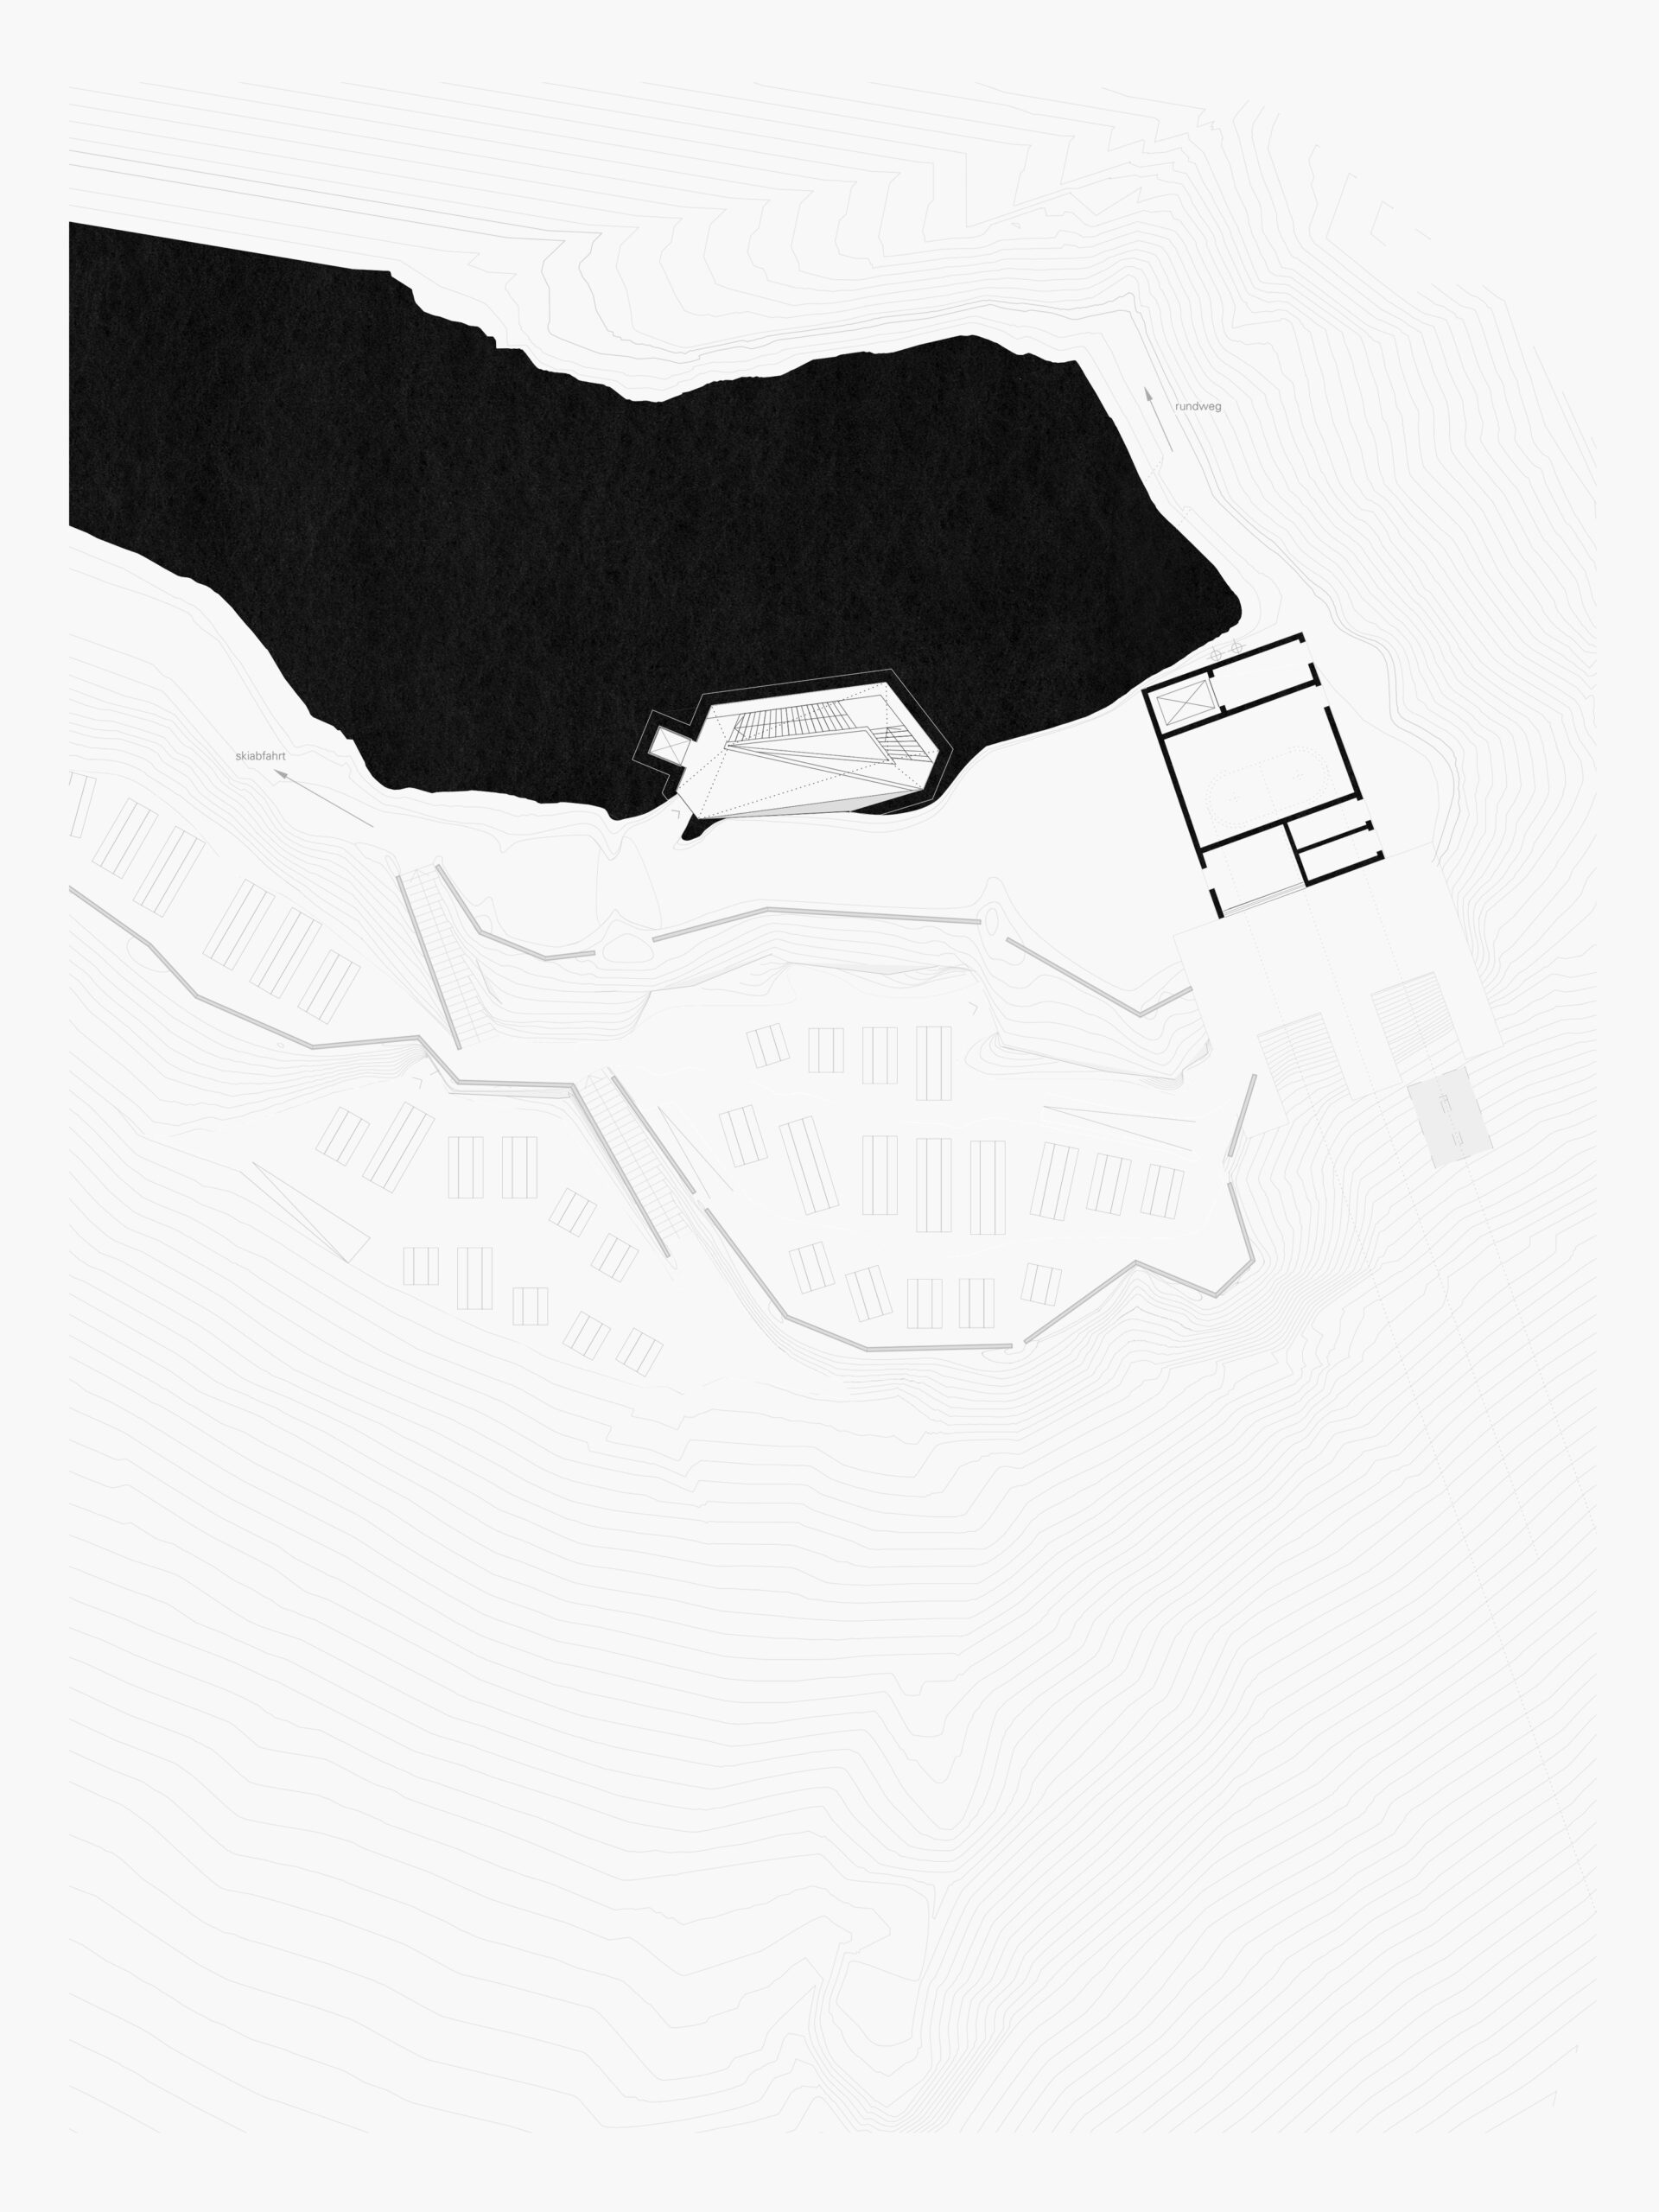 Michael-Becker-Architects-Architekten-Gipfelstation-Nebelhorn-Grundriss-2